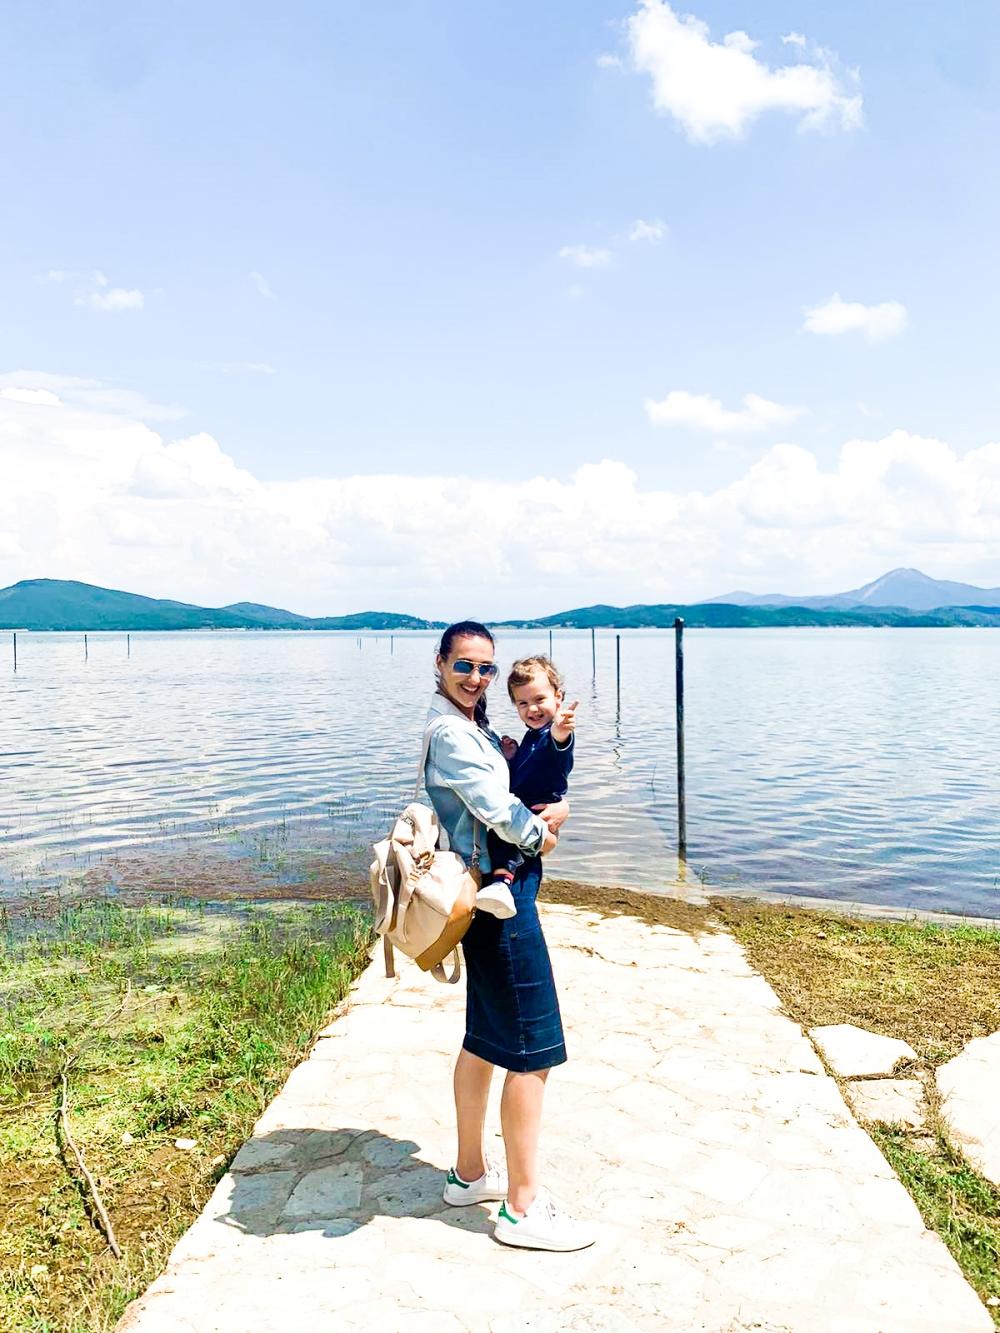 Limni Plastiras fotografies, Plastira Lake travel photos